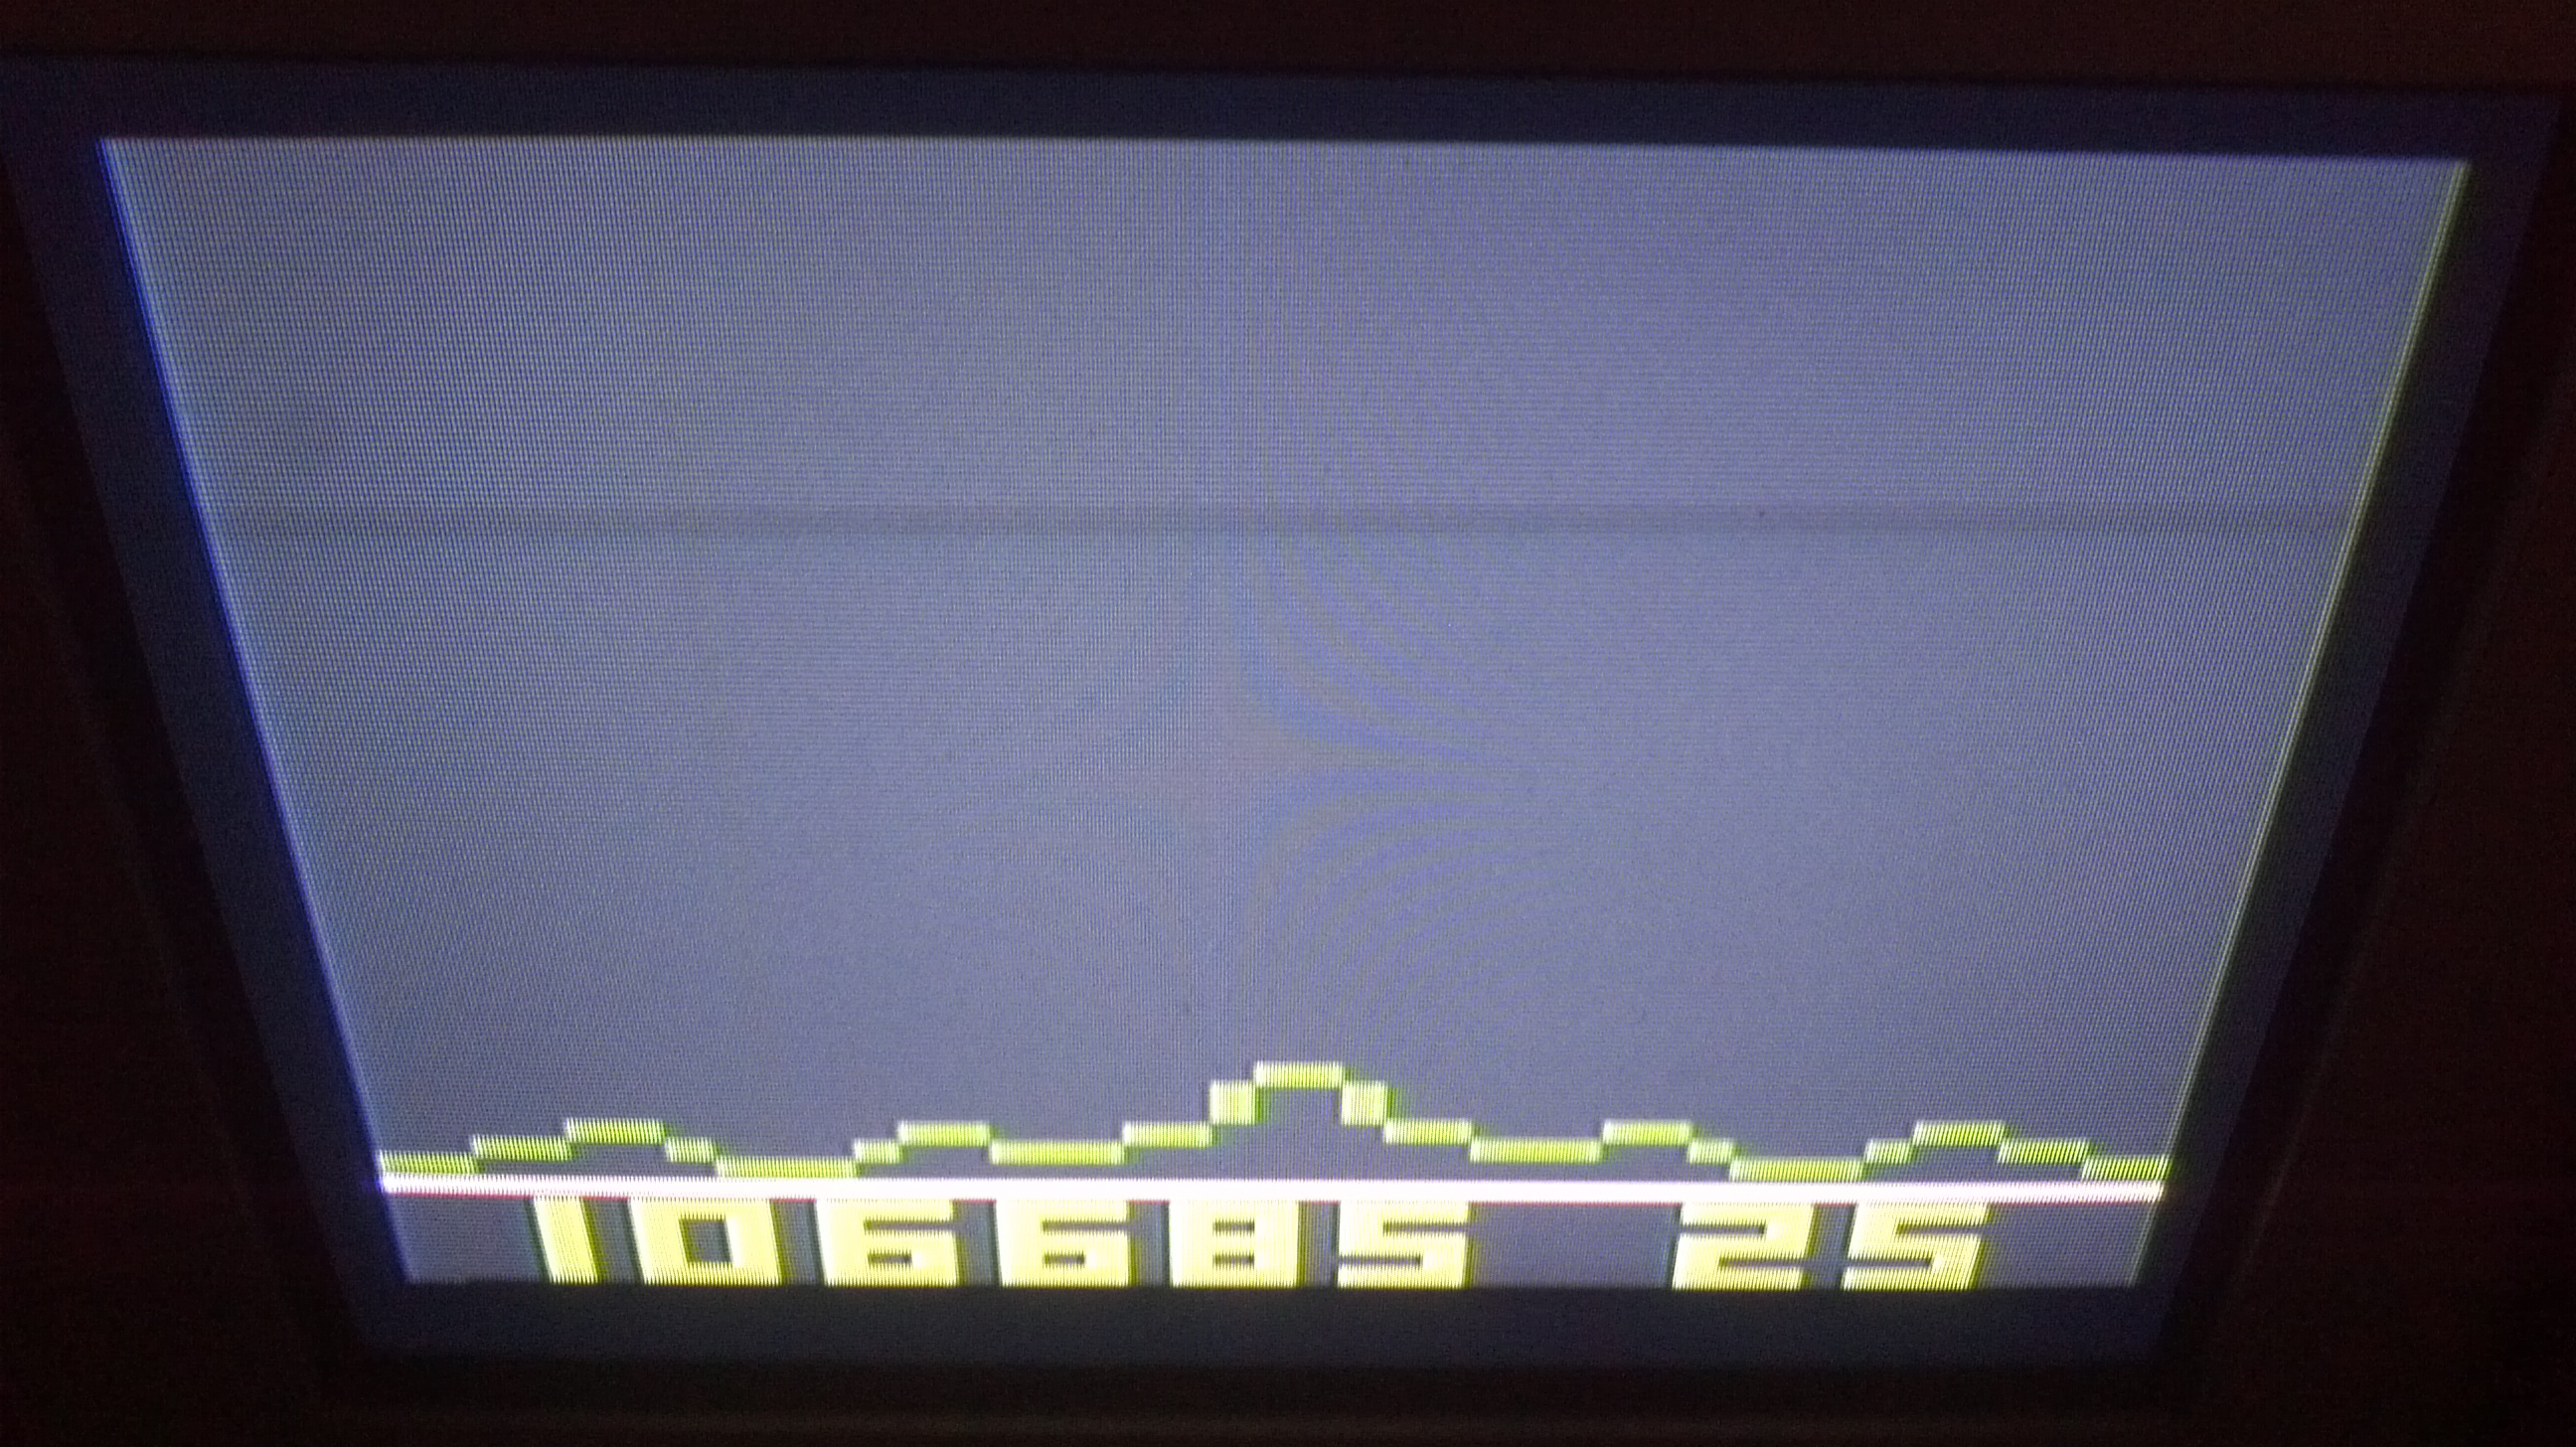 Liduario: Astroblast (Atari 2600 Novice/B) 106,685 points on 2014-05-28 21:12:30